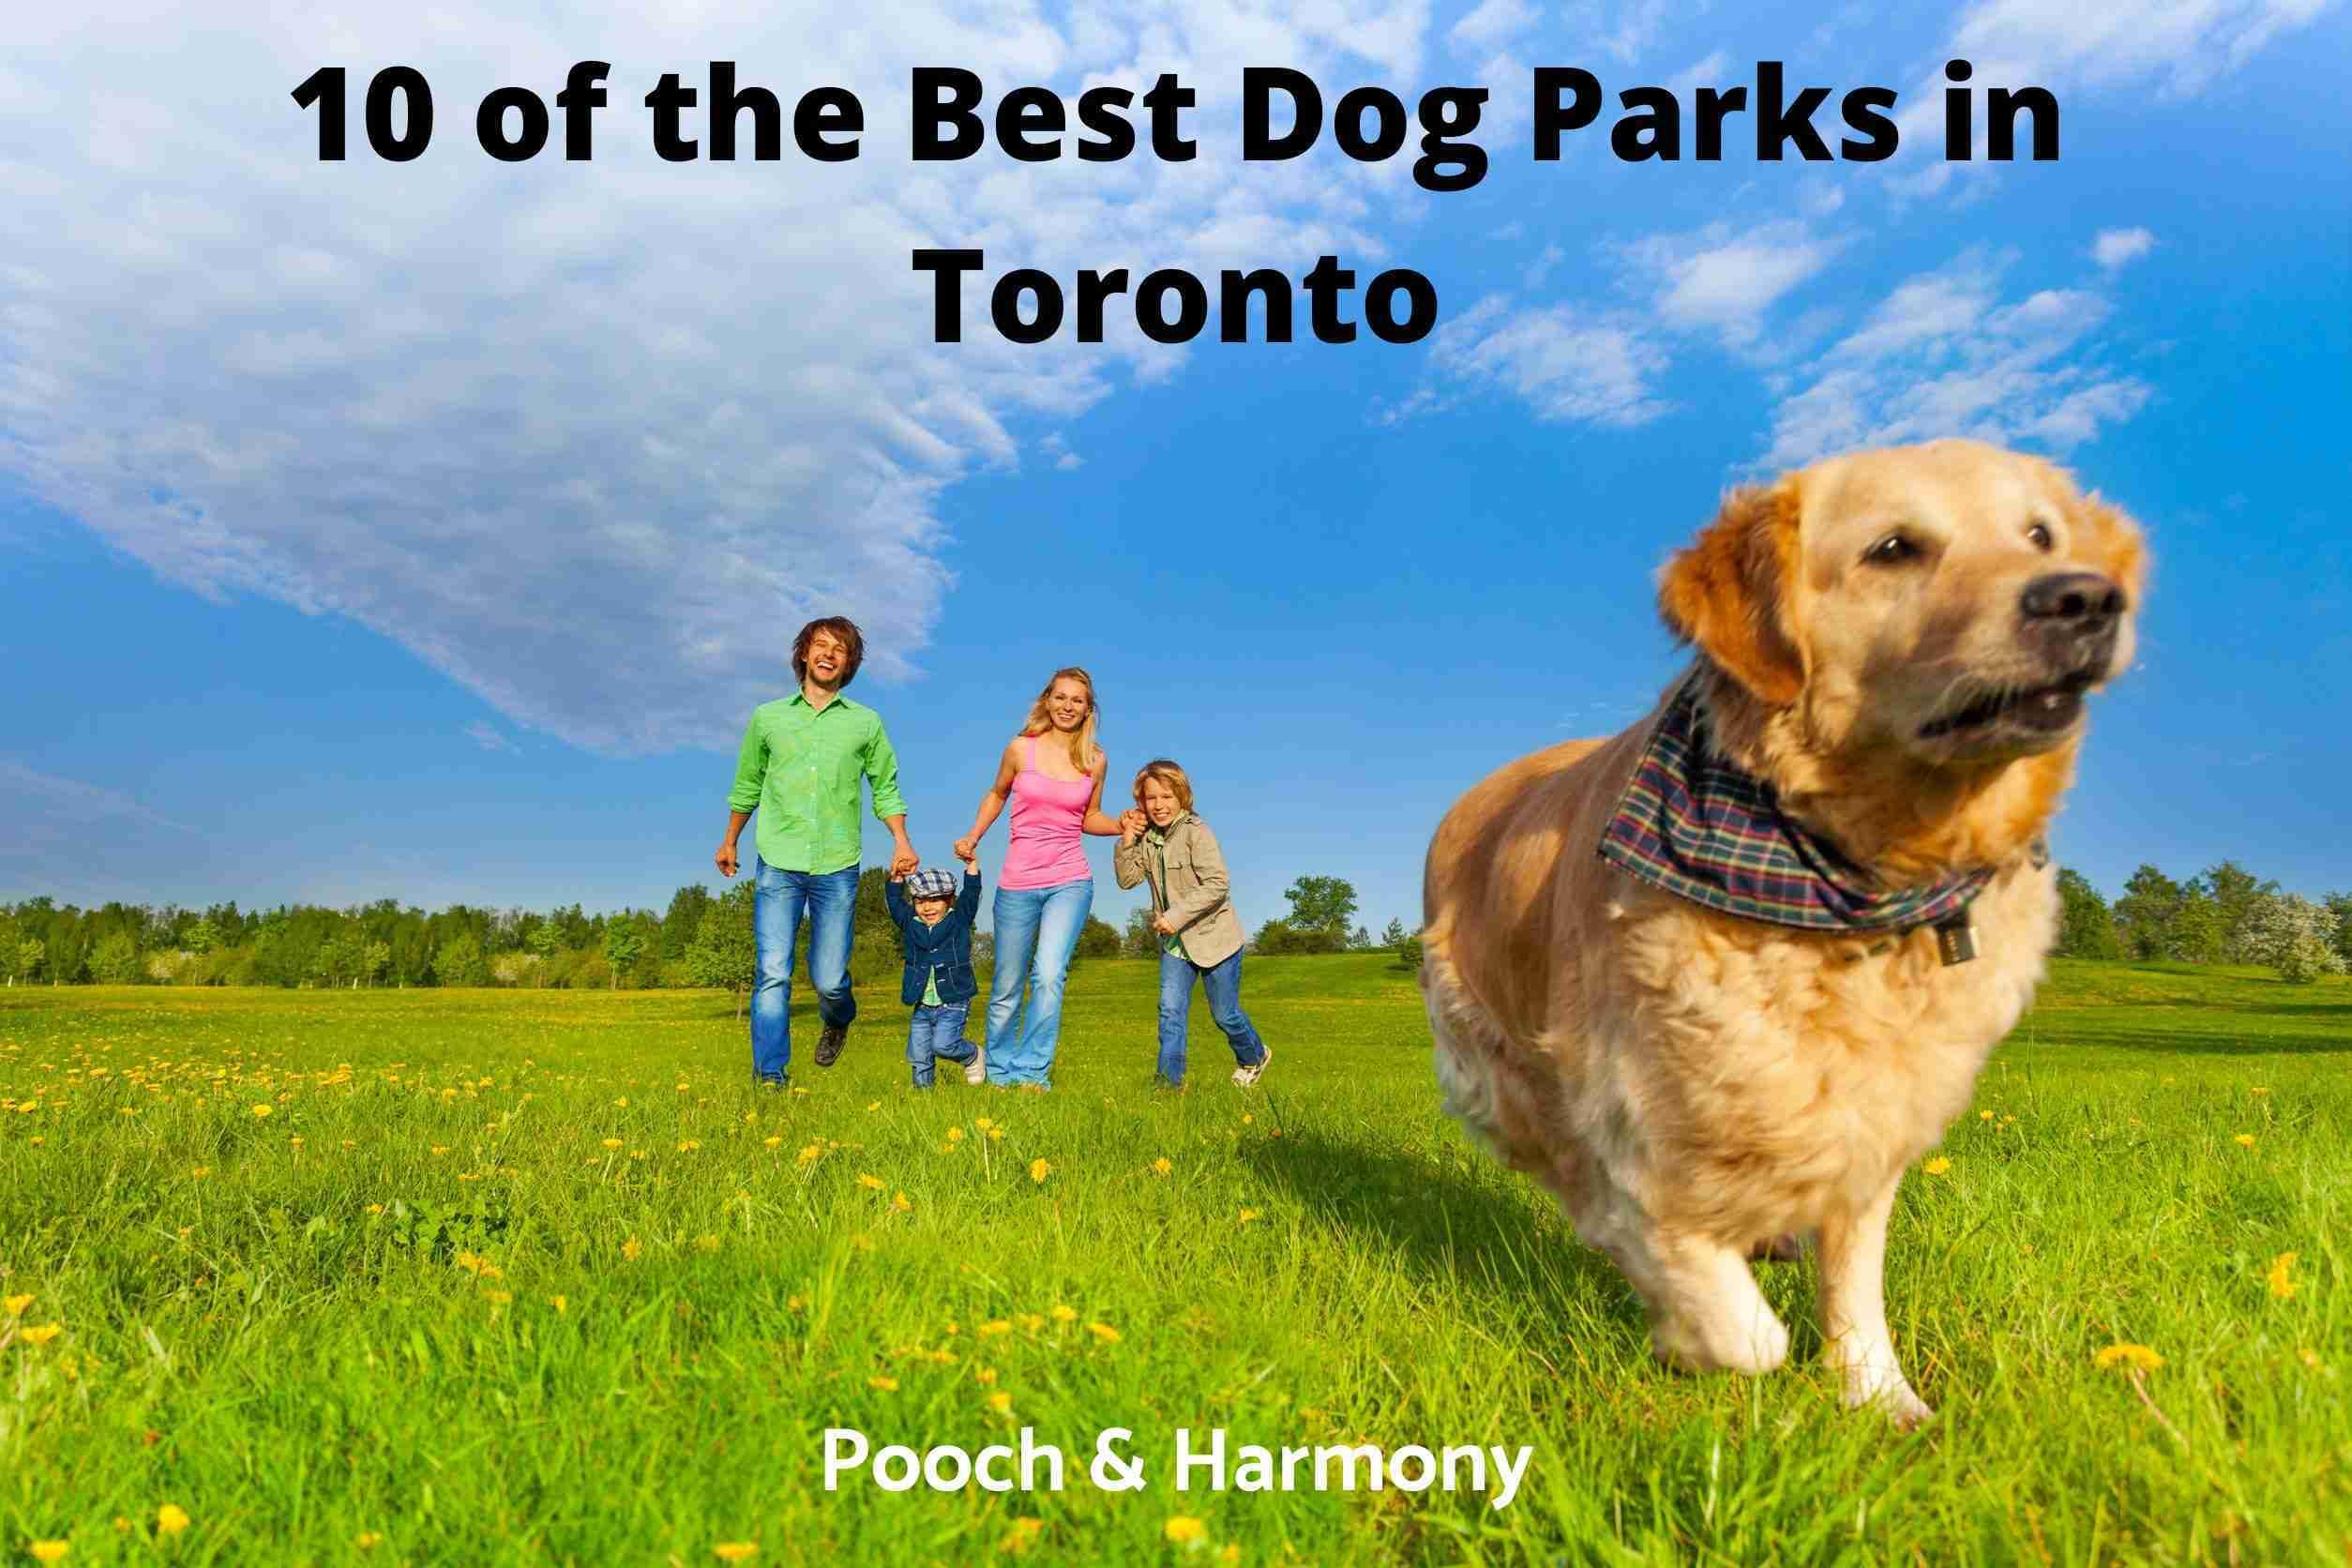 Best Dog Parks in Toronto